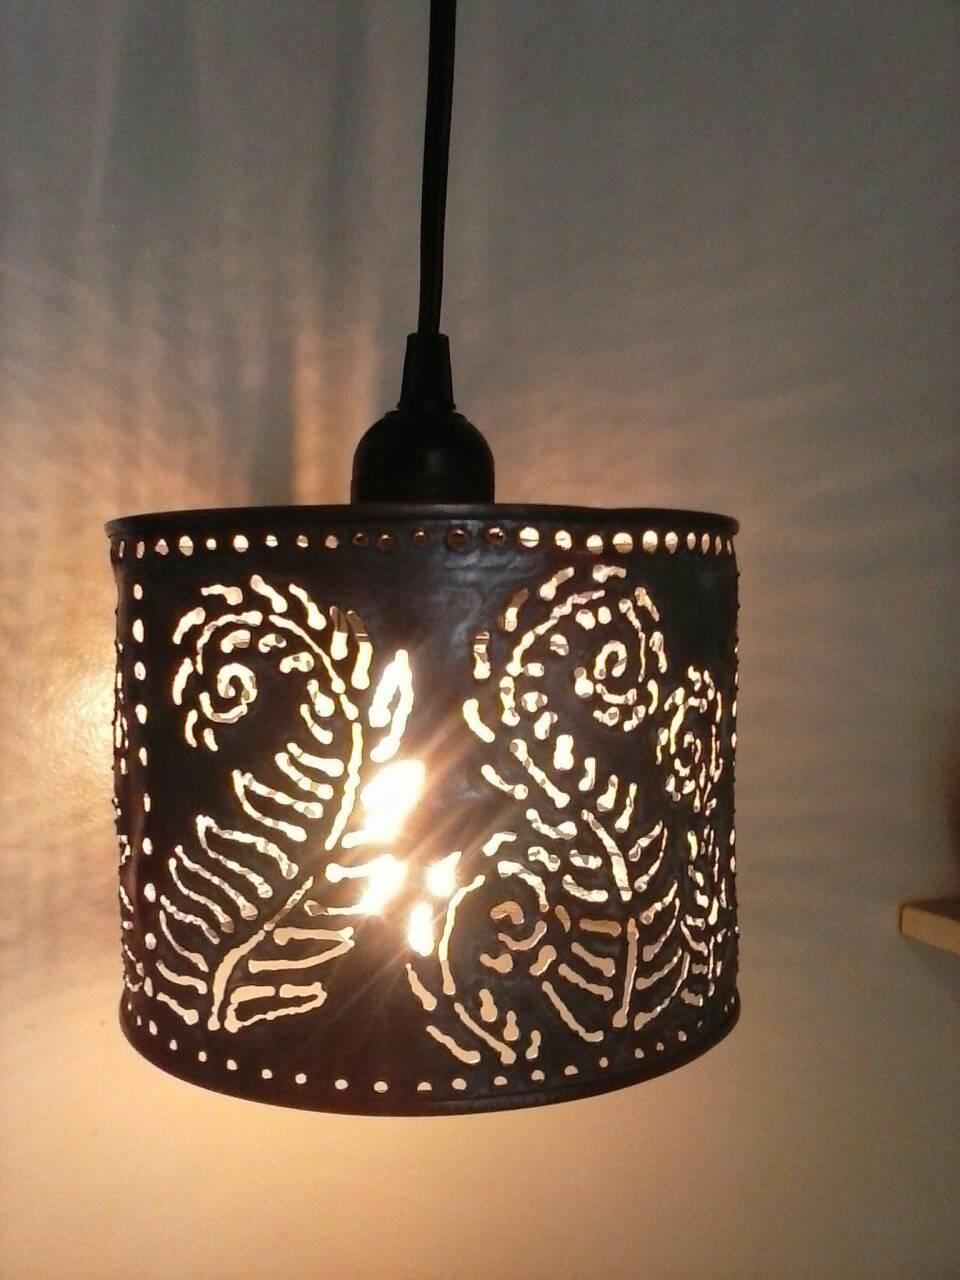 Tin Pendant Lights - Baby-Exit regarding Tin Pendant Lights (Image 14 of 15)